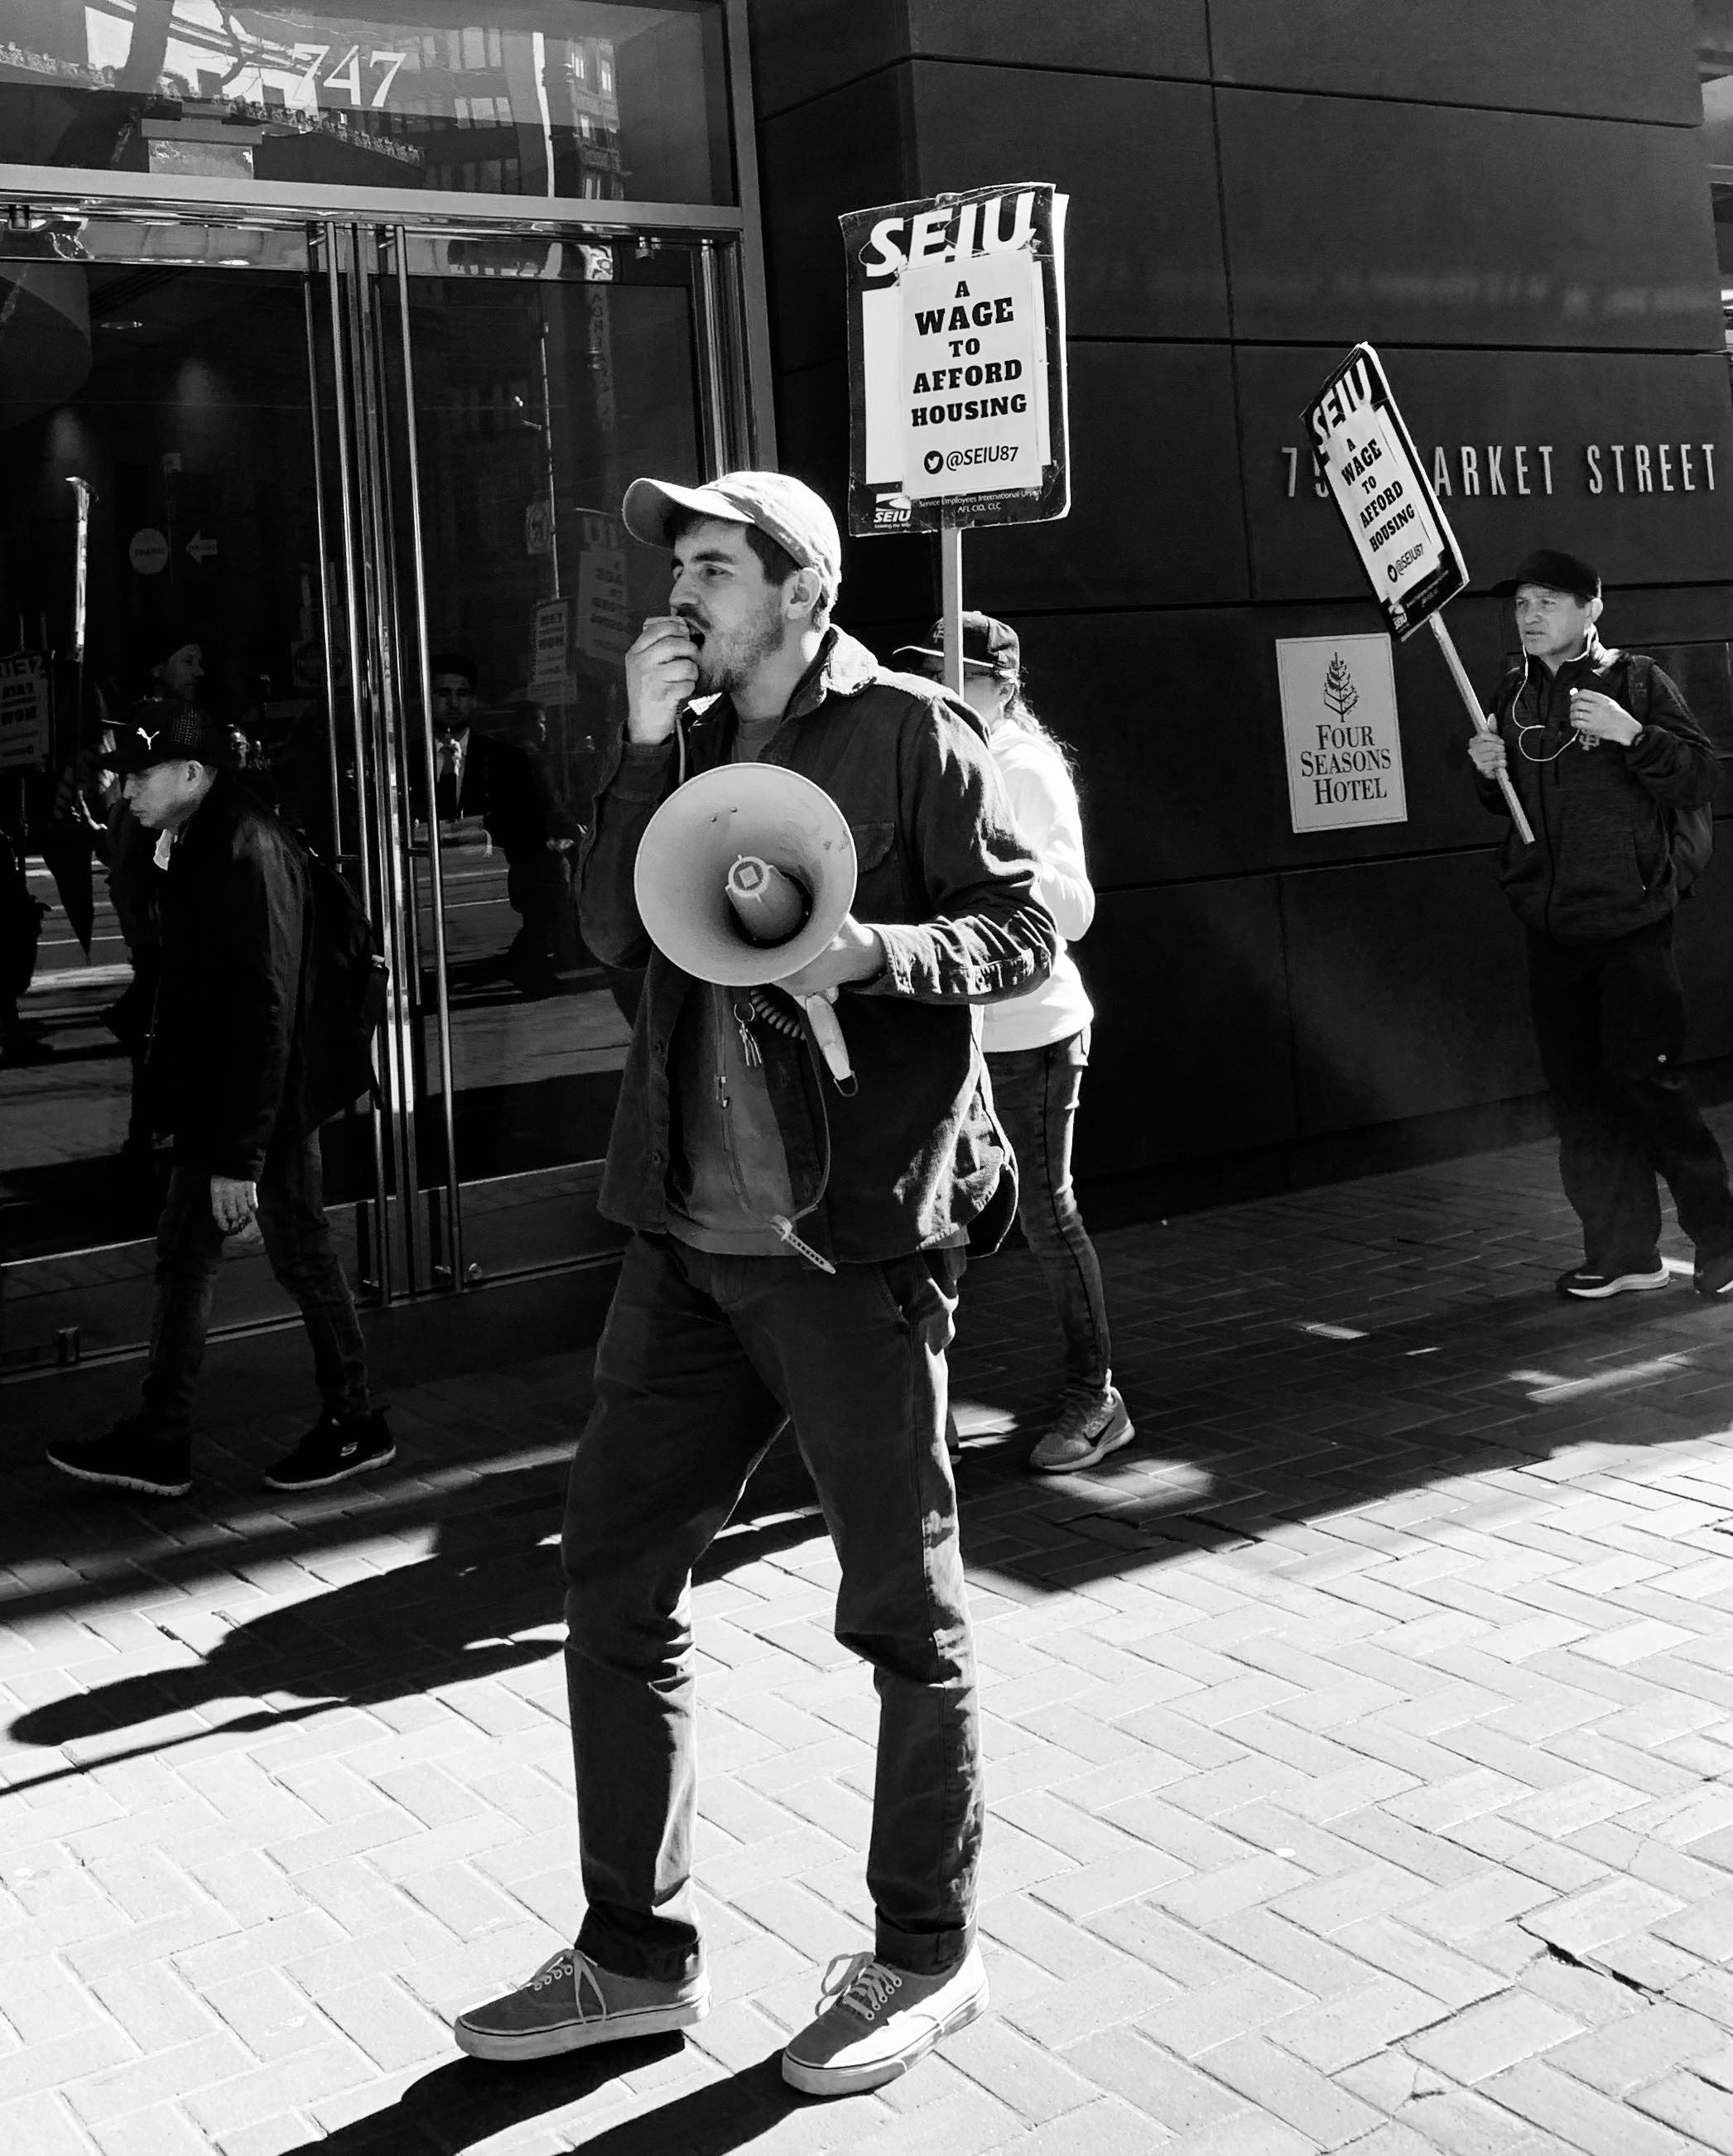 Alexis SEIU Protest